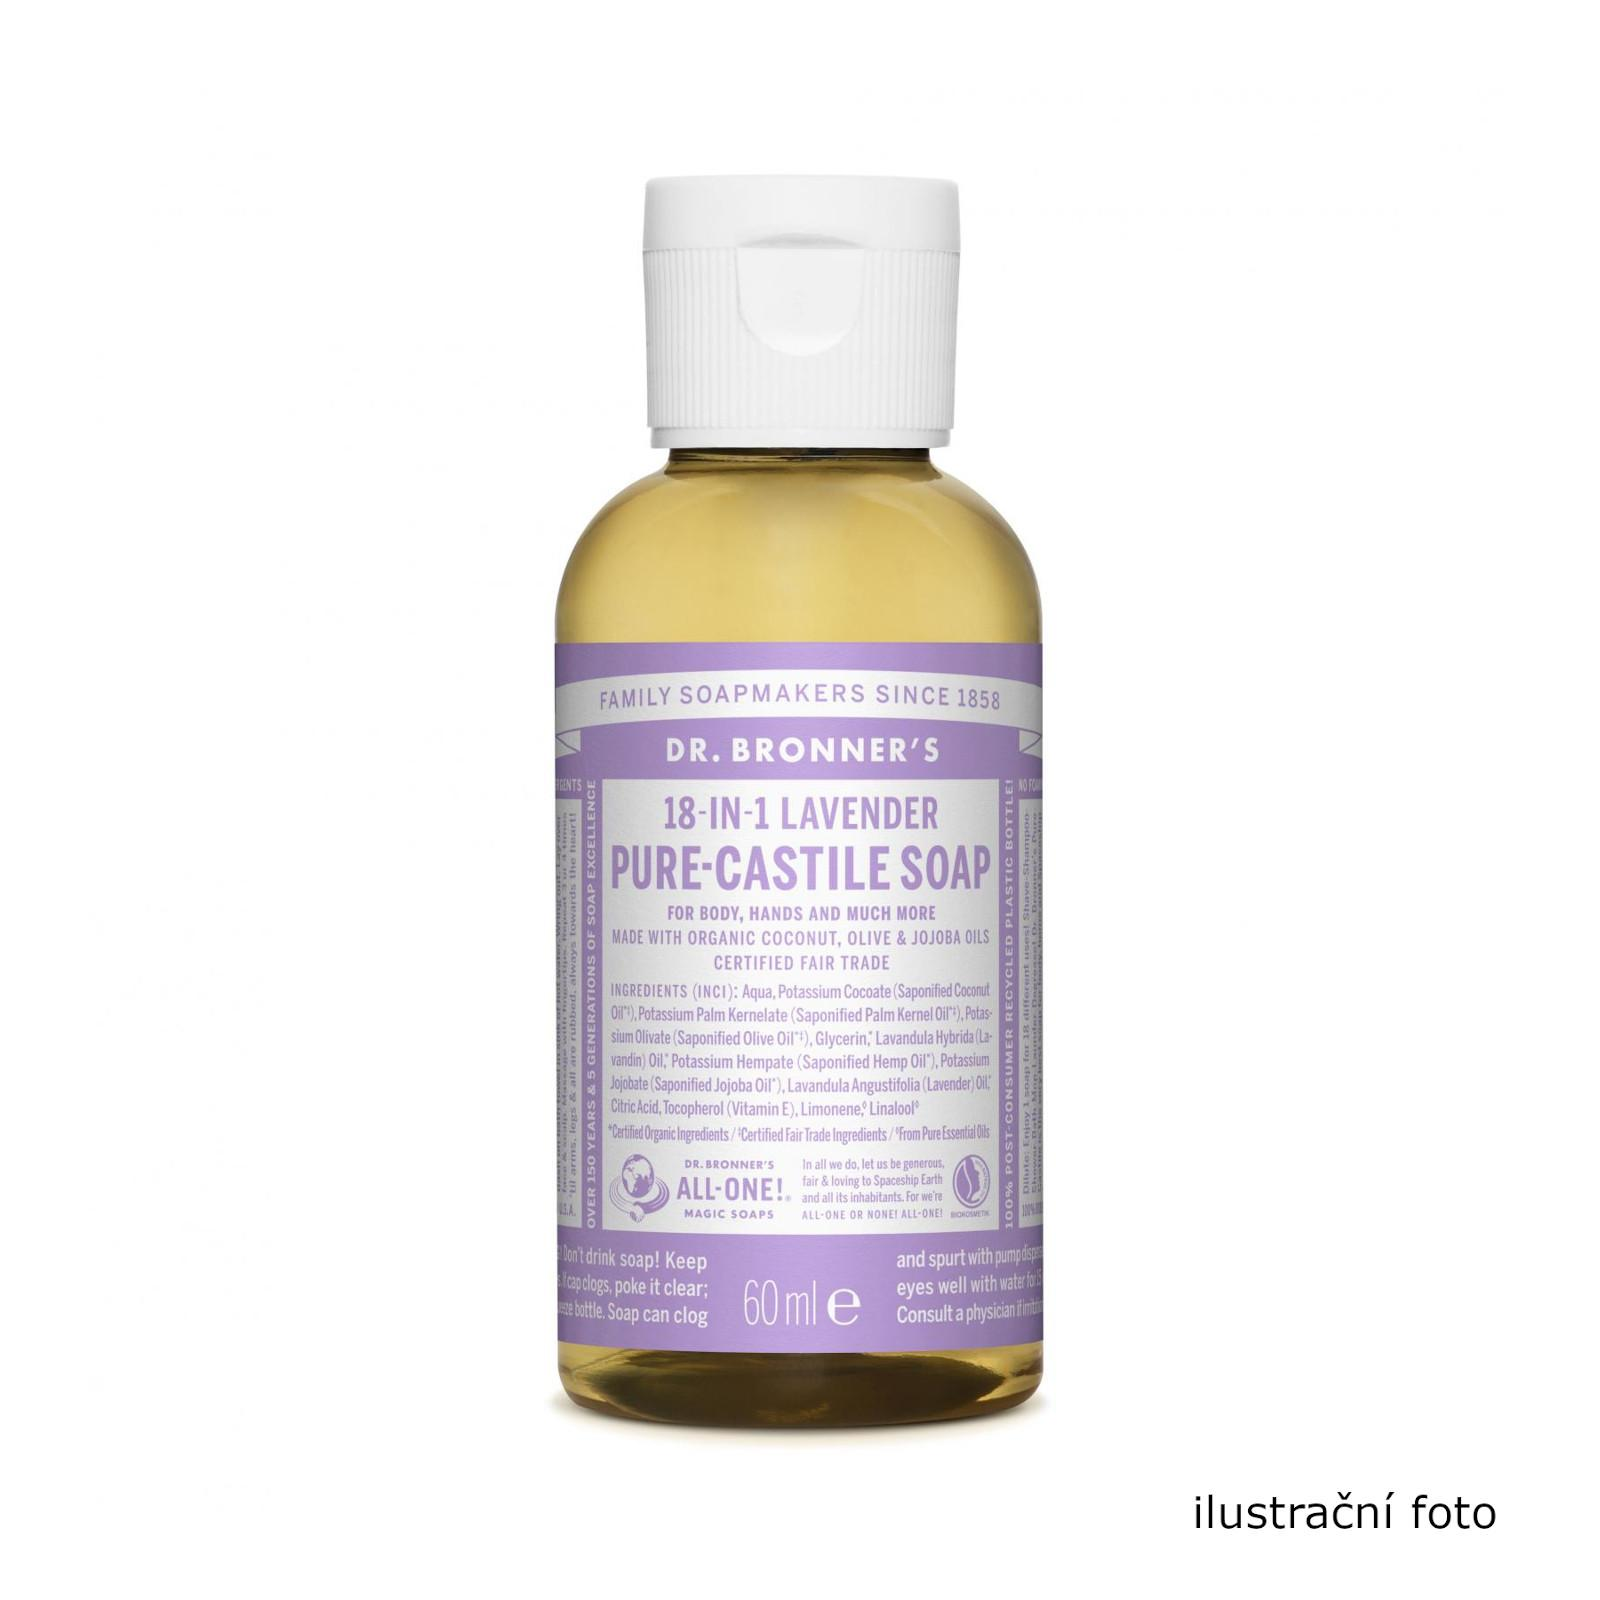 Dr. Bronner's Tekuté universální mýdlo ALL-ONE!, Lavender 10 ml